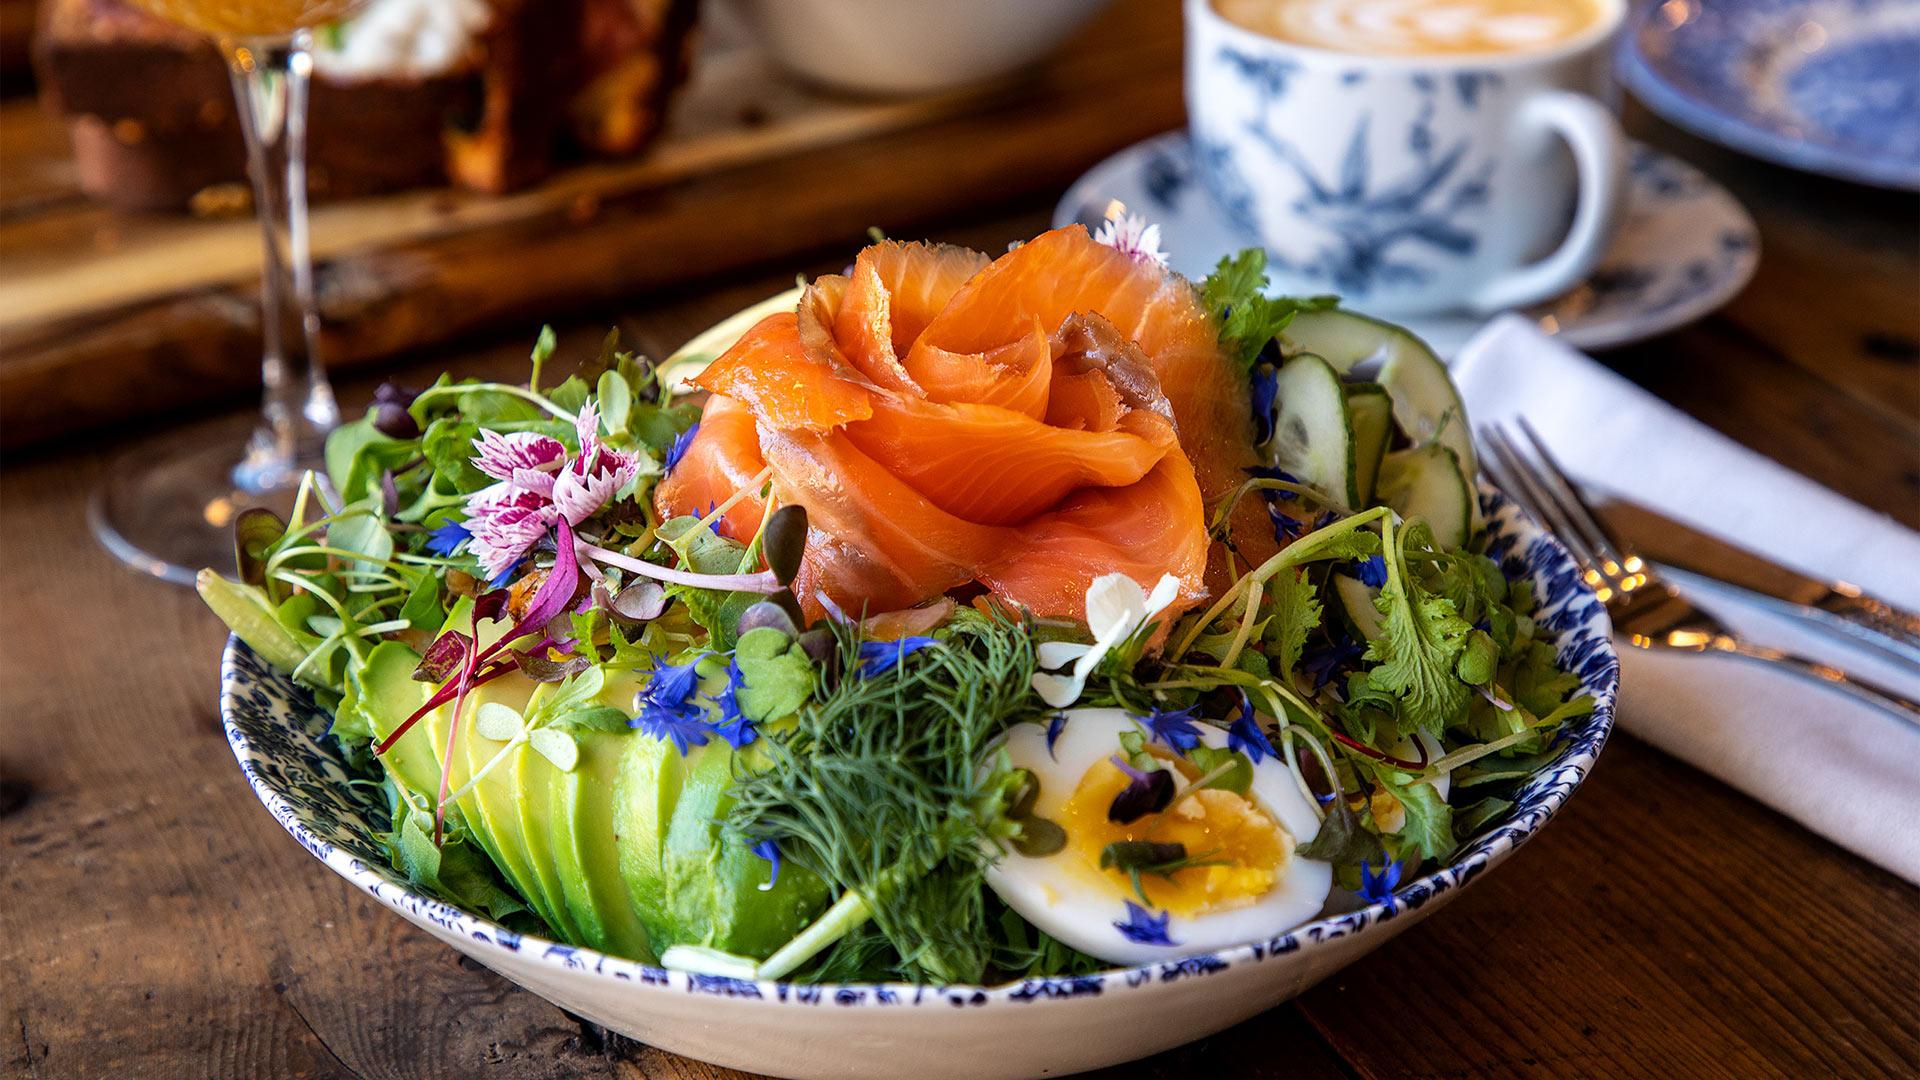 imagesolutions food, nourriture, pub, conception